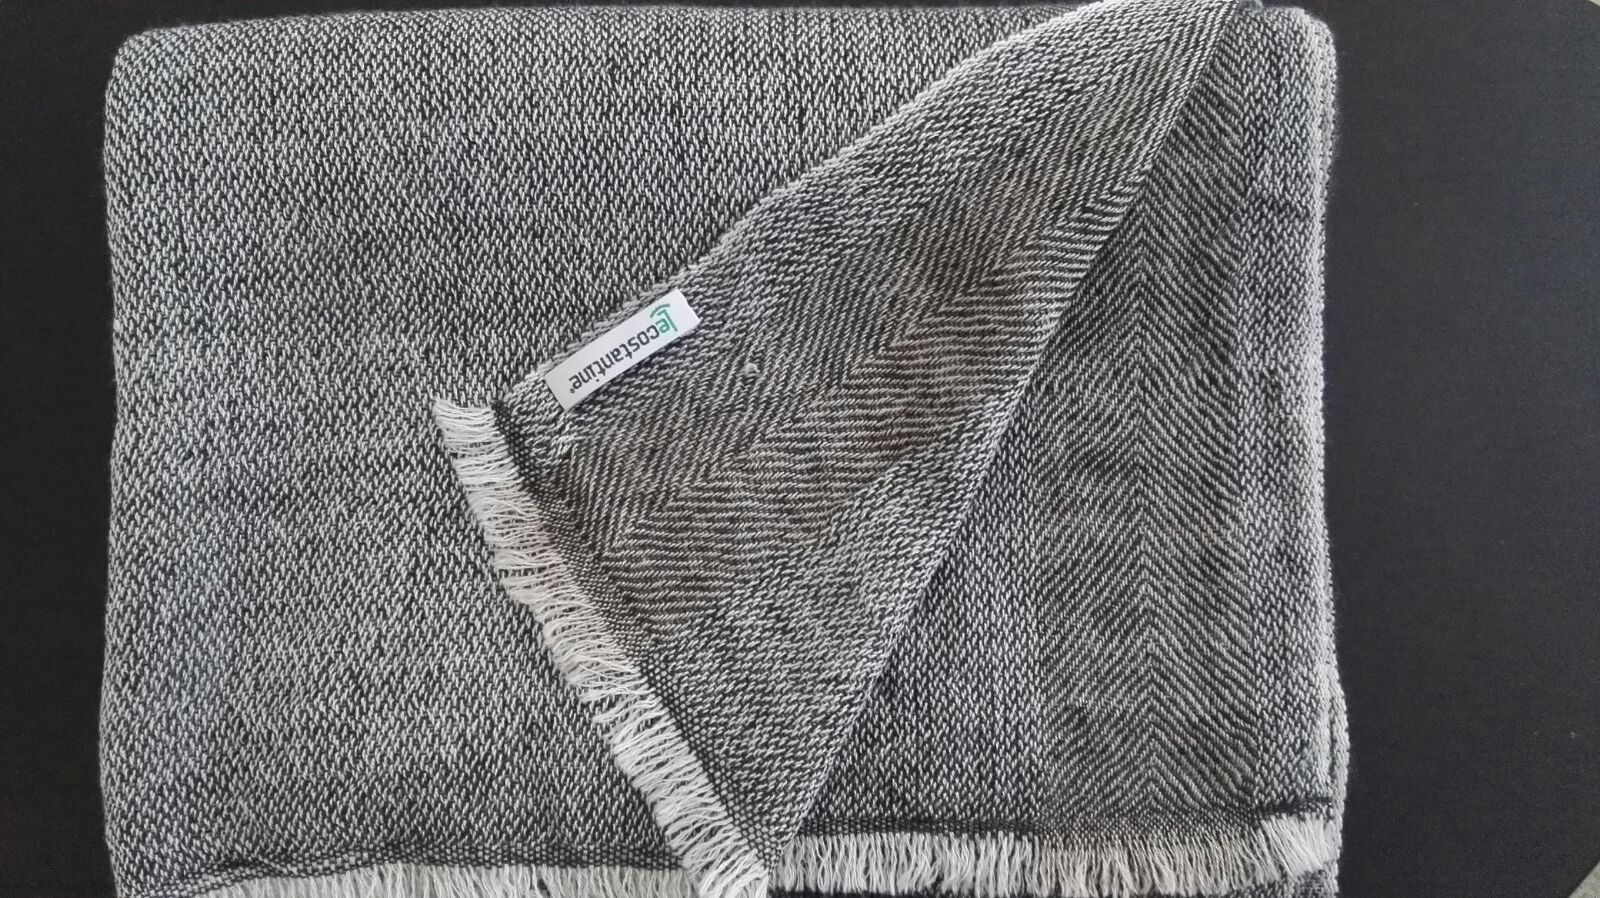 Le Costantine Tessitura Sciarpa da donna in cachemire grigia 1.jpeg. Sciarpa  da donna in cachemire e seta - cod. 14caa46fc1a